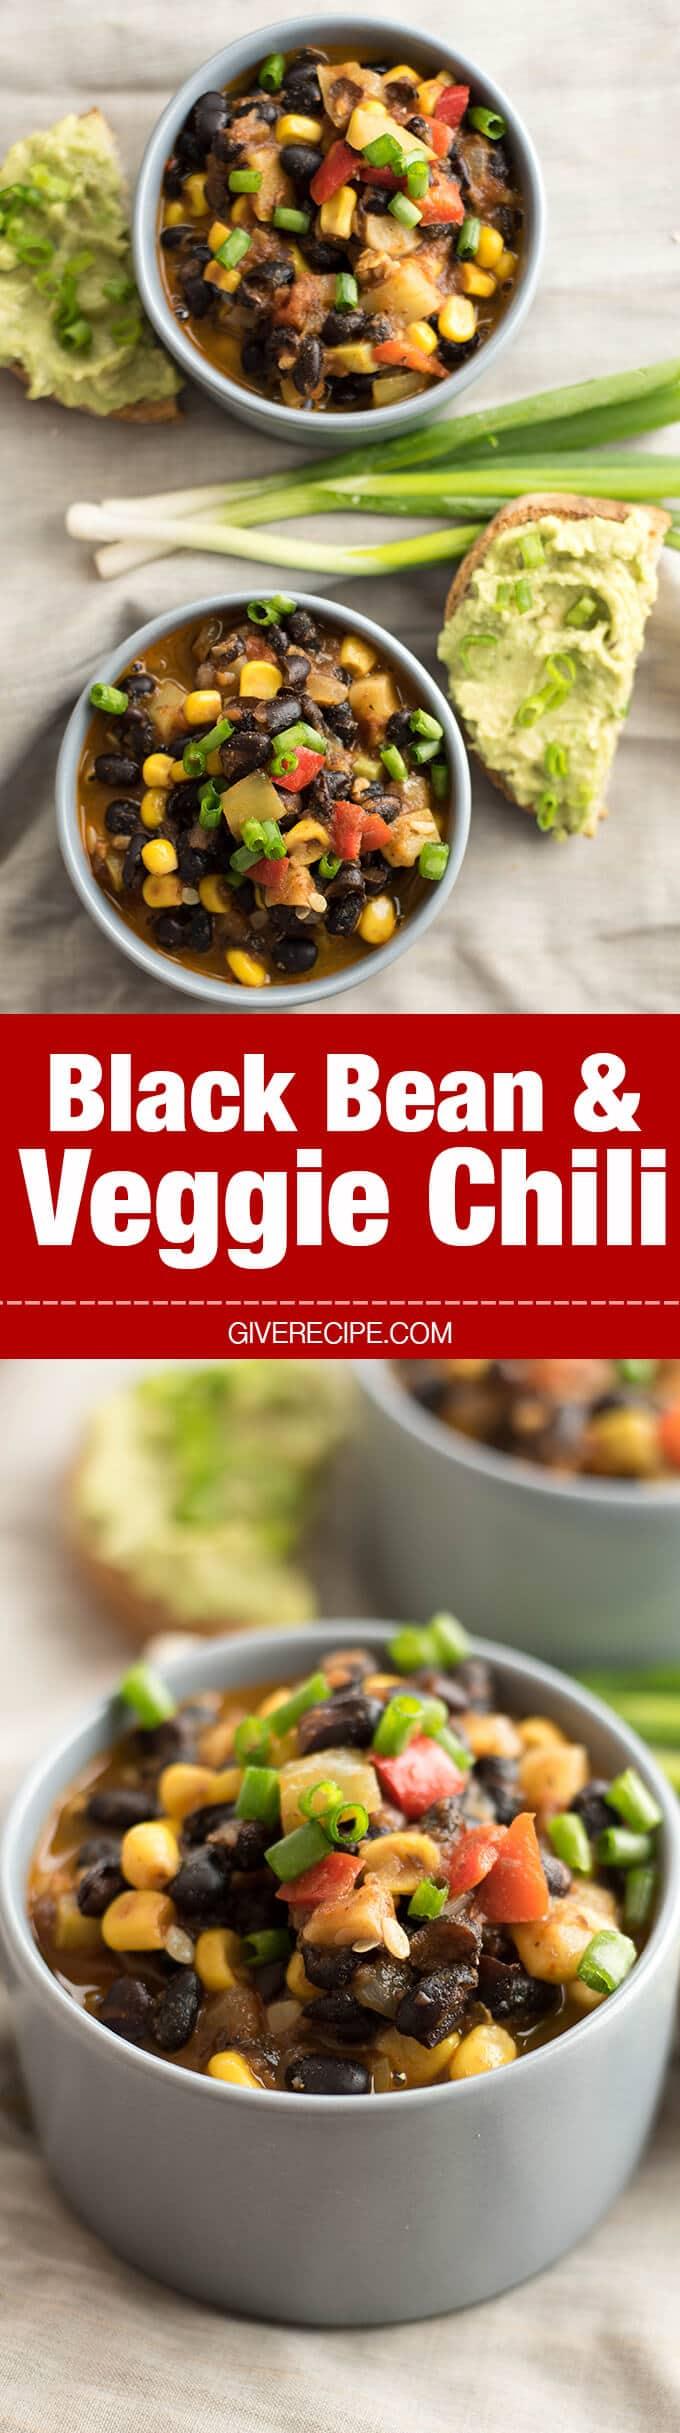 Black Bean and Veggie Chili a